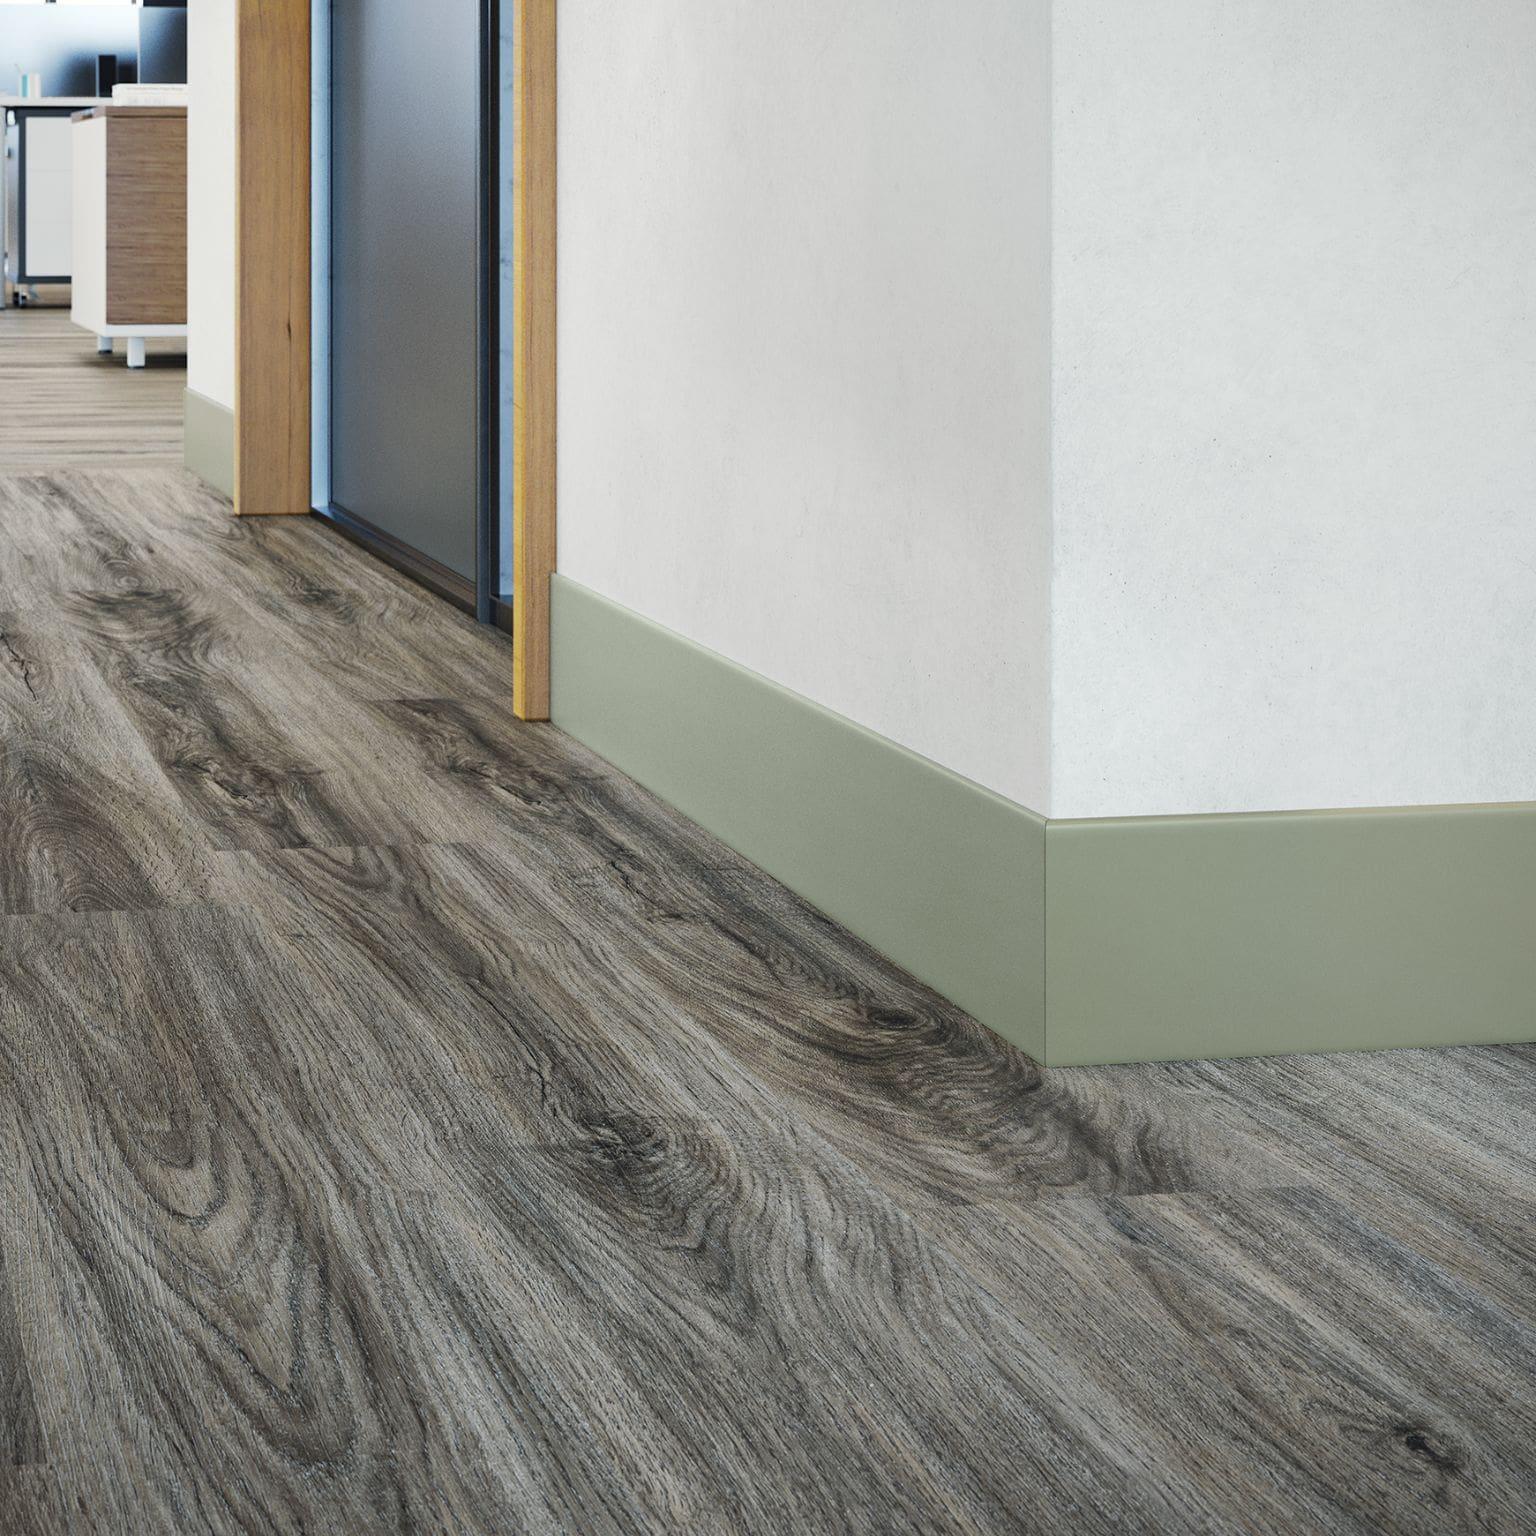 Mannington Flooring Edge Effects rubber wall base